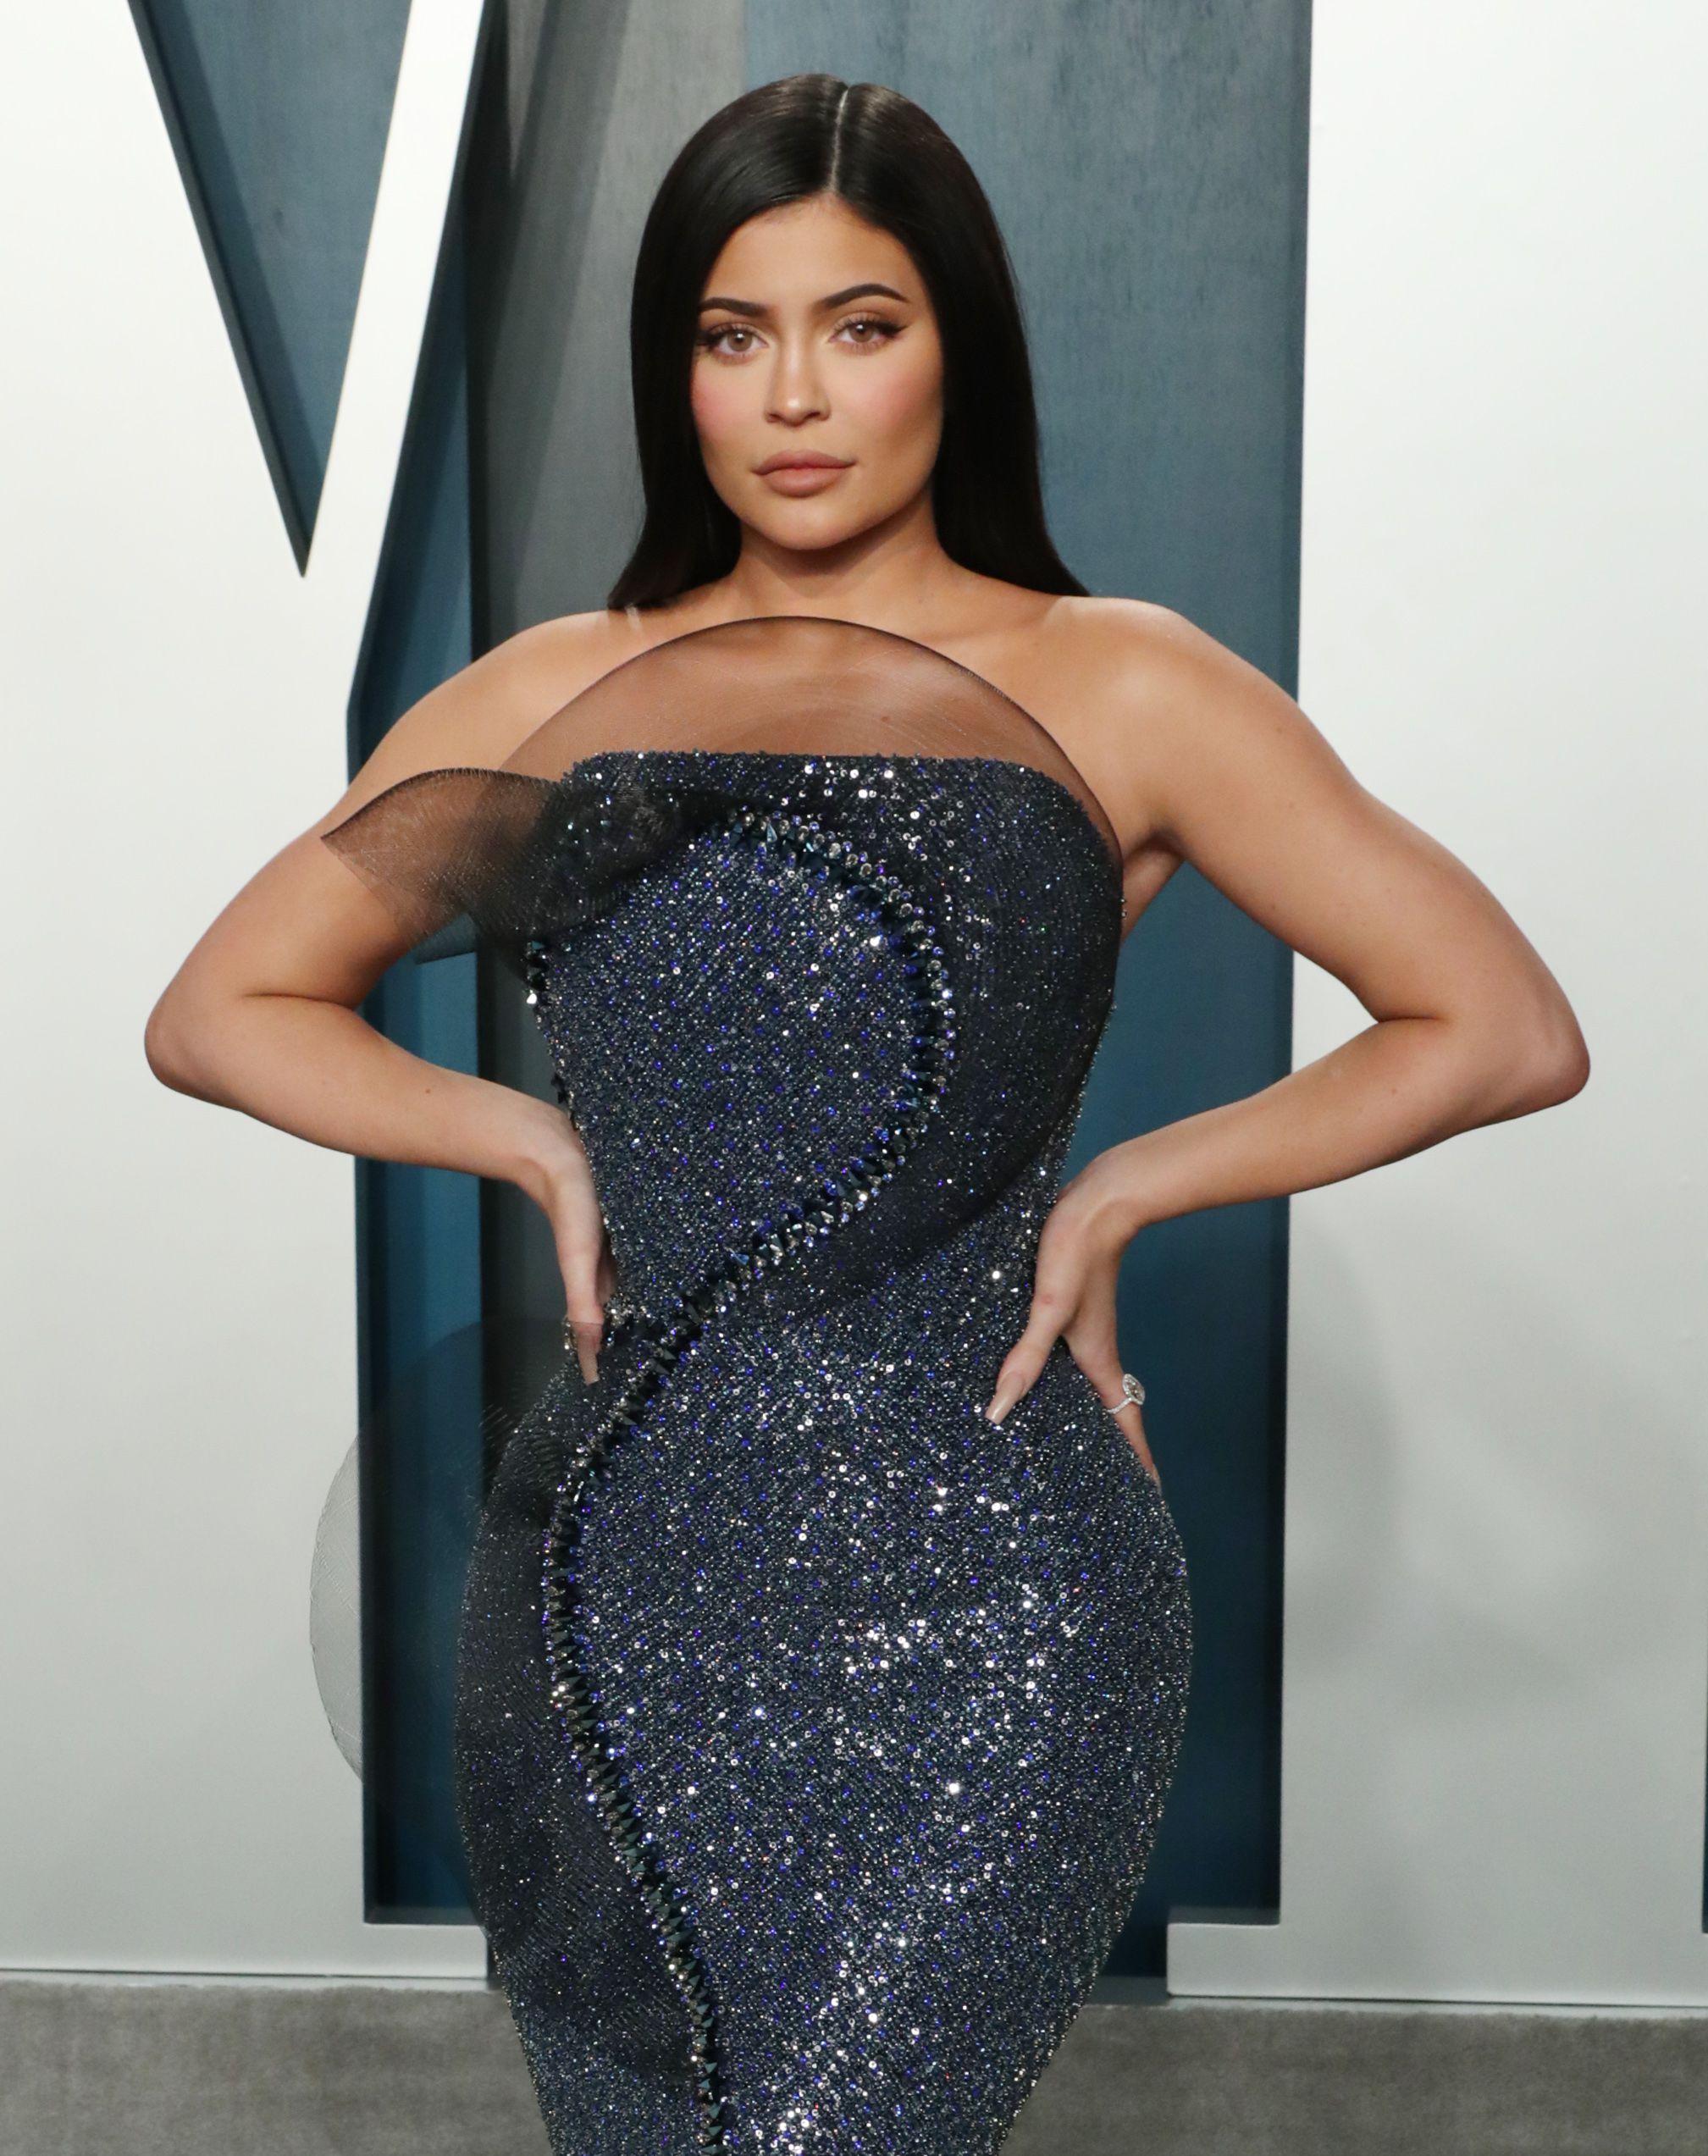 Is Kylie Jenner Having a Boy? Drops Blue Heart Pregnancy Clue